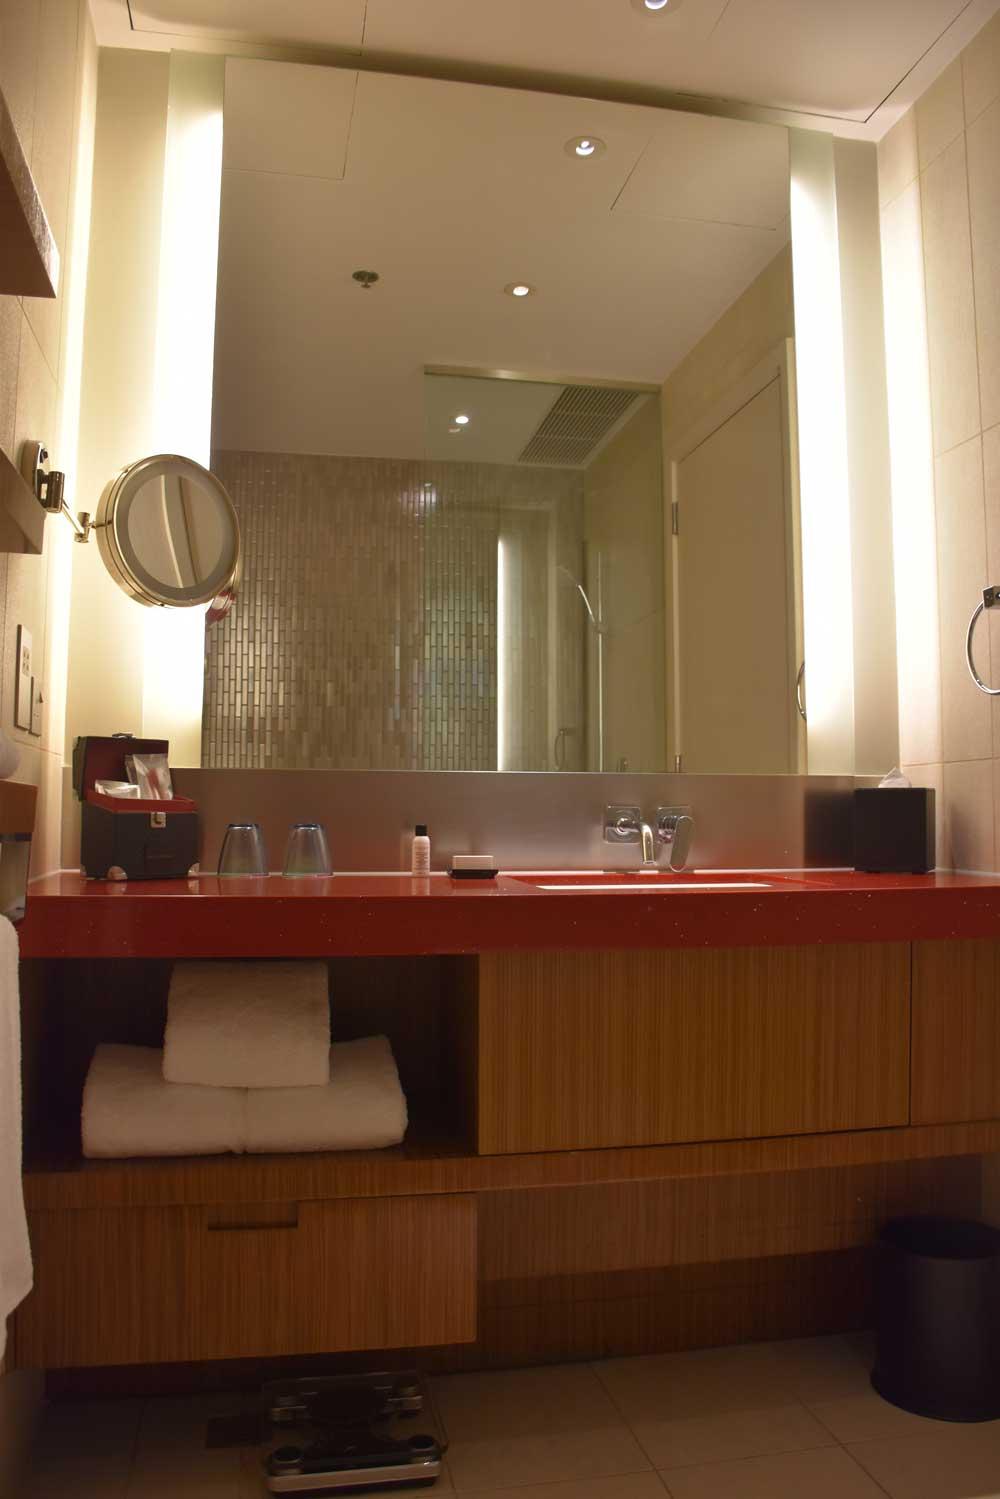 Countdown Hotel Standard King bathroom